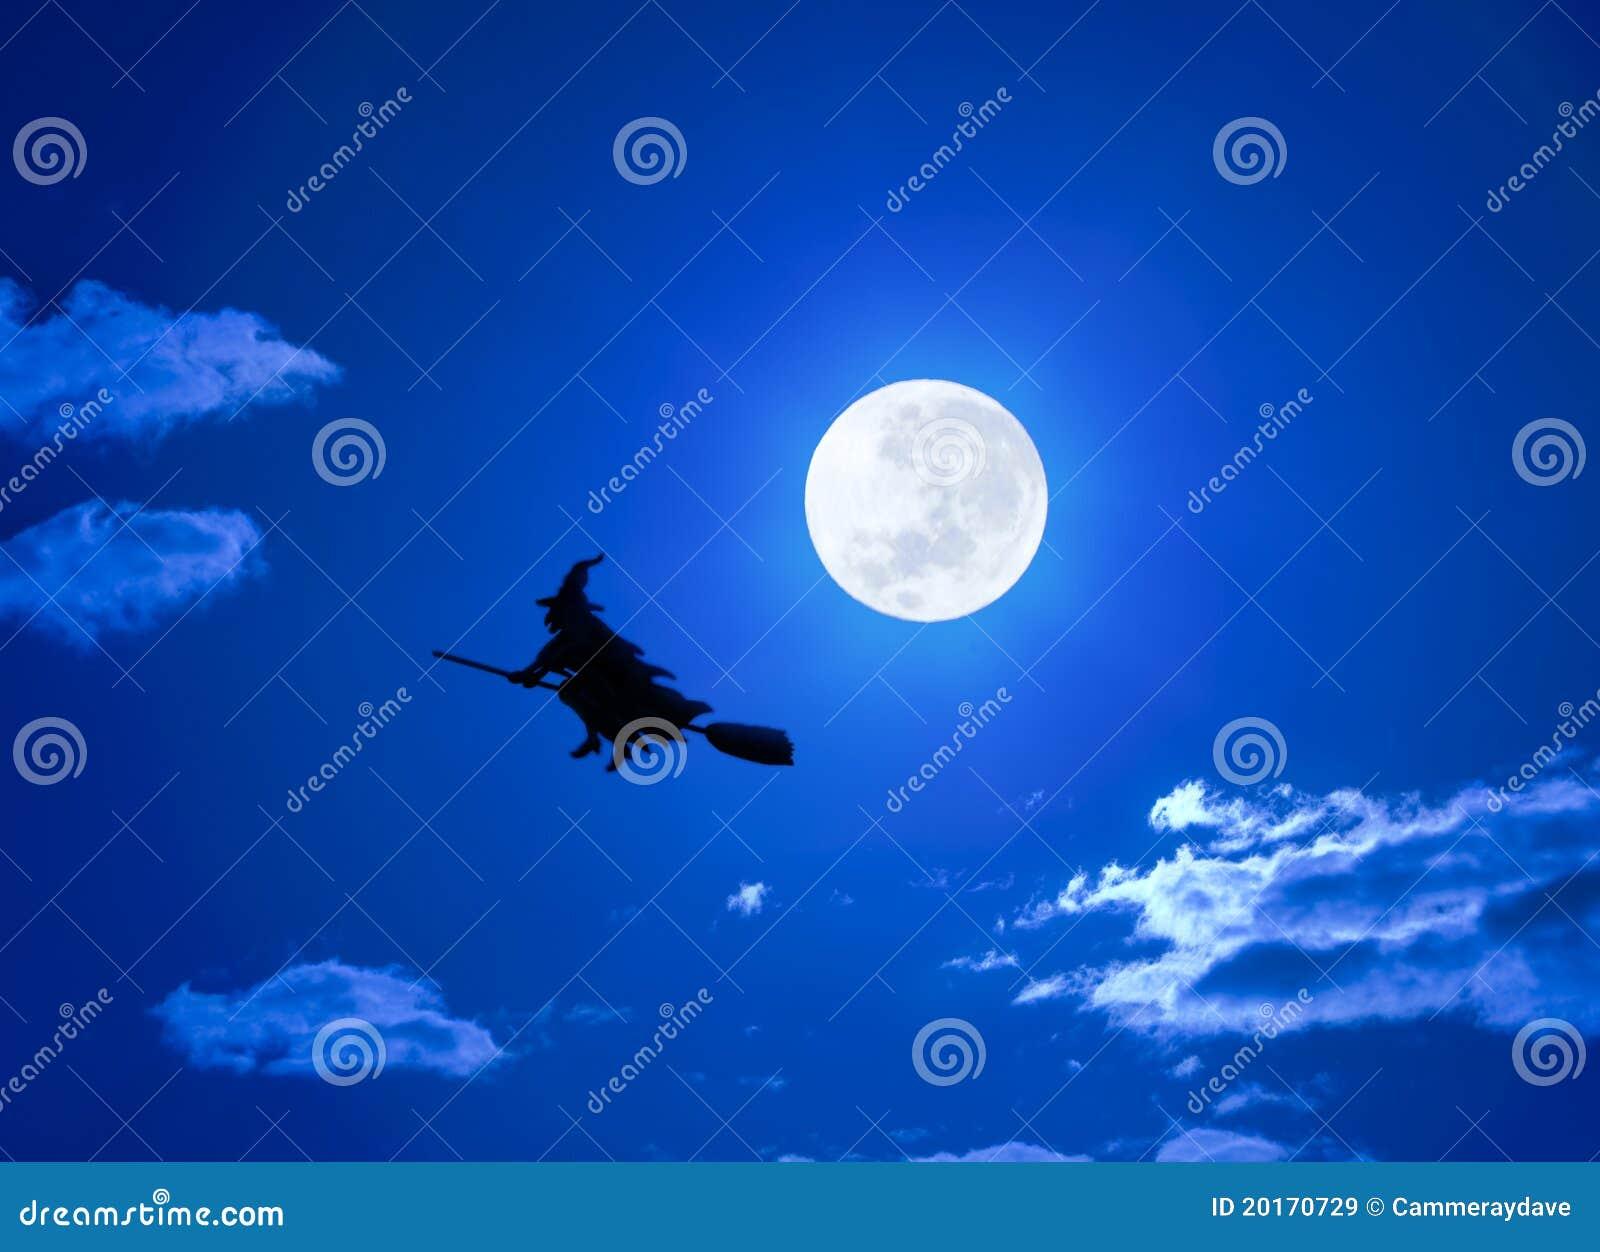 Halloween-Hexe-Flugwesen auf Broomstick